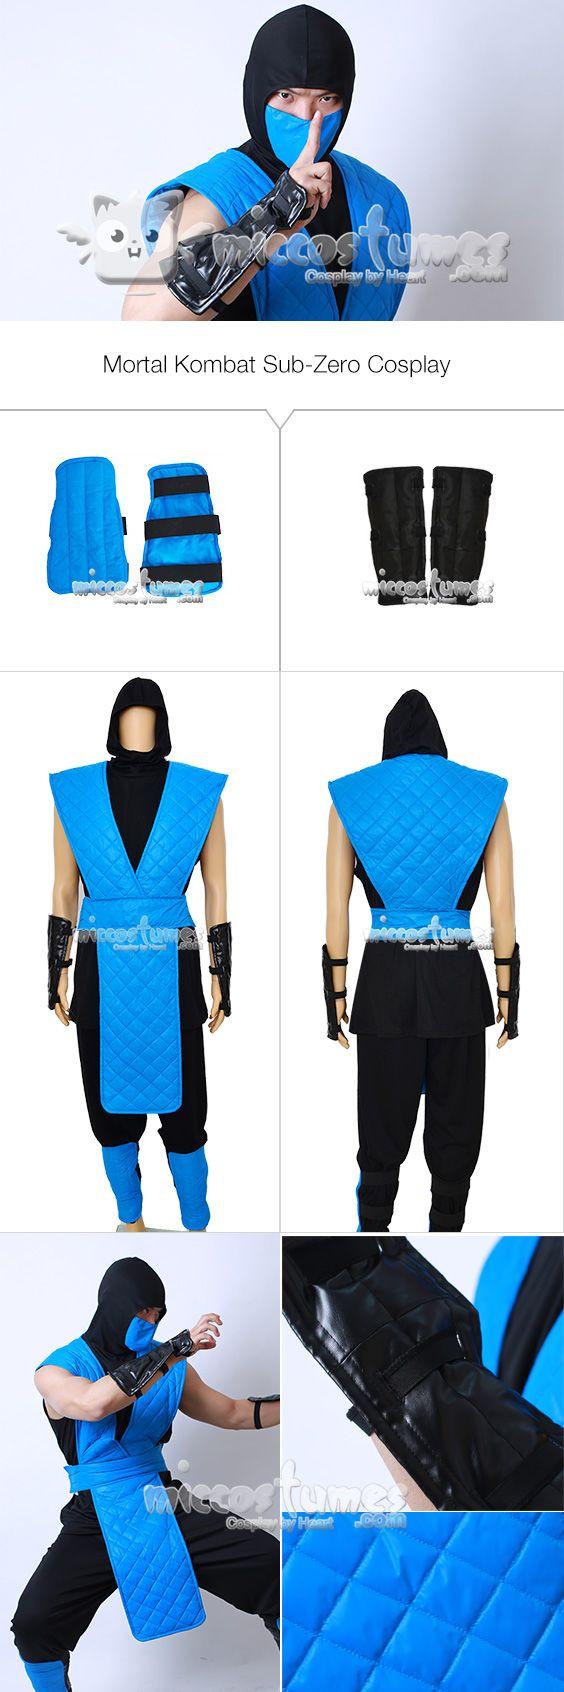 More details of Mortal Kombat Sub-Zero Cosplay Costume  #cosplay #miccostumes #mortalkombat #subzero #cosplaycostume #ninja